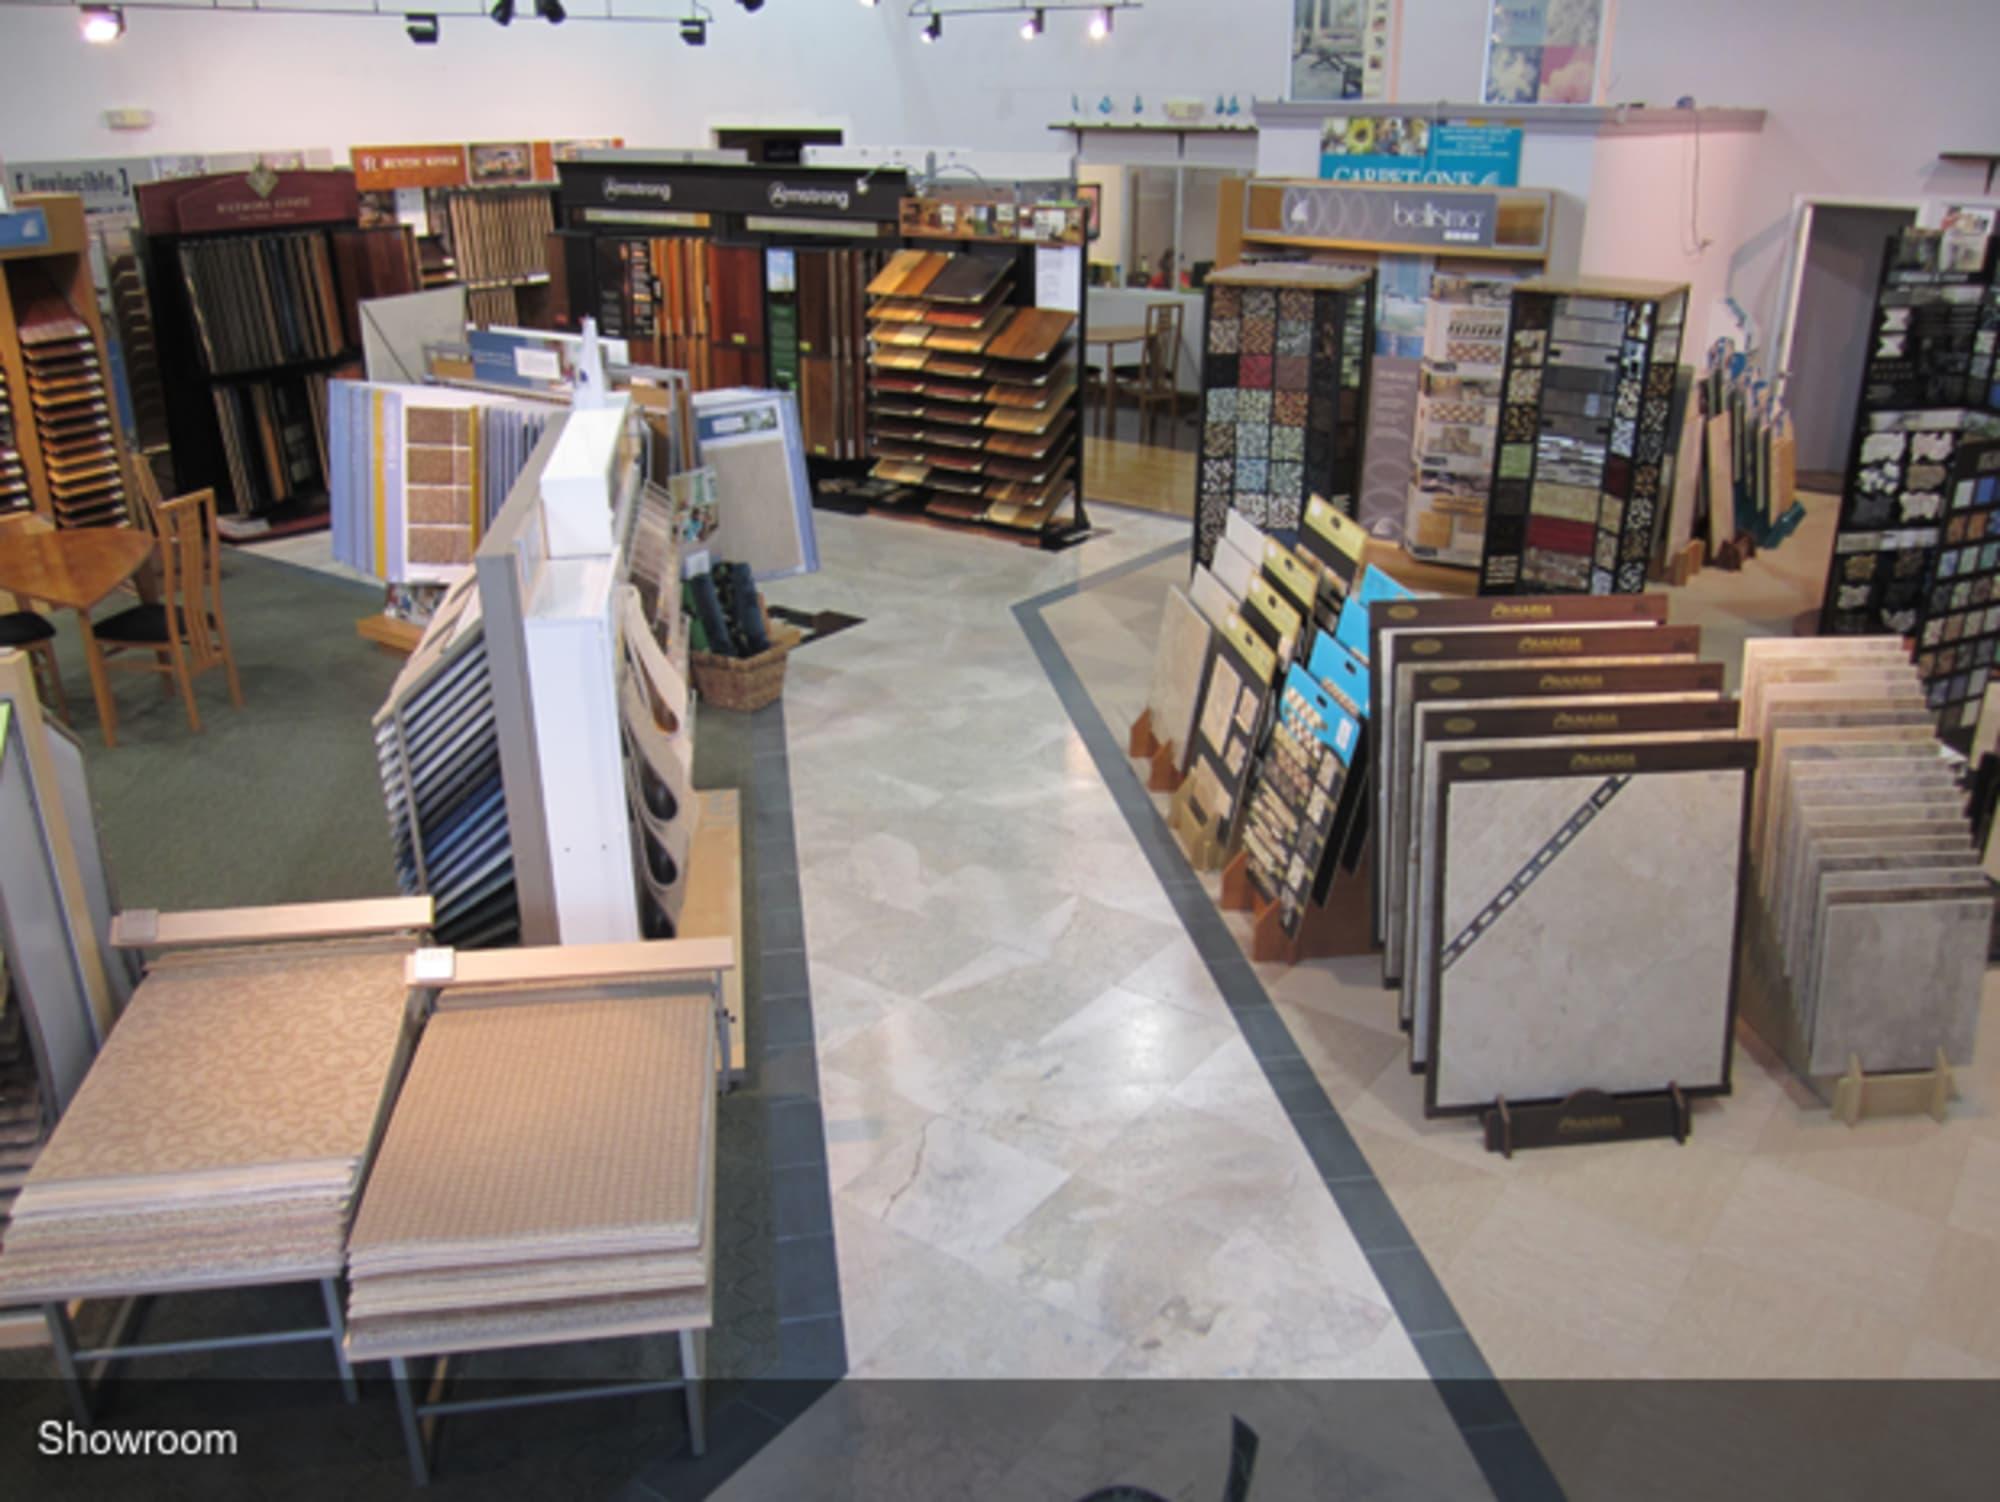 Allfloors Carpet One - 12220 SW 129th Ct Miami, FL 33186